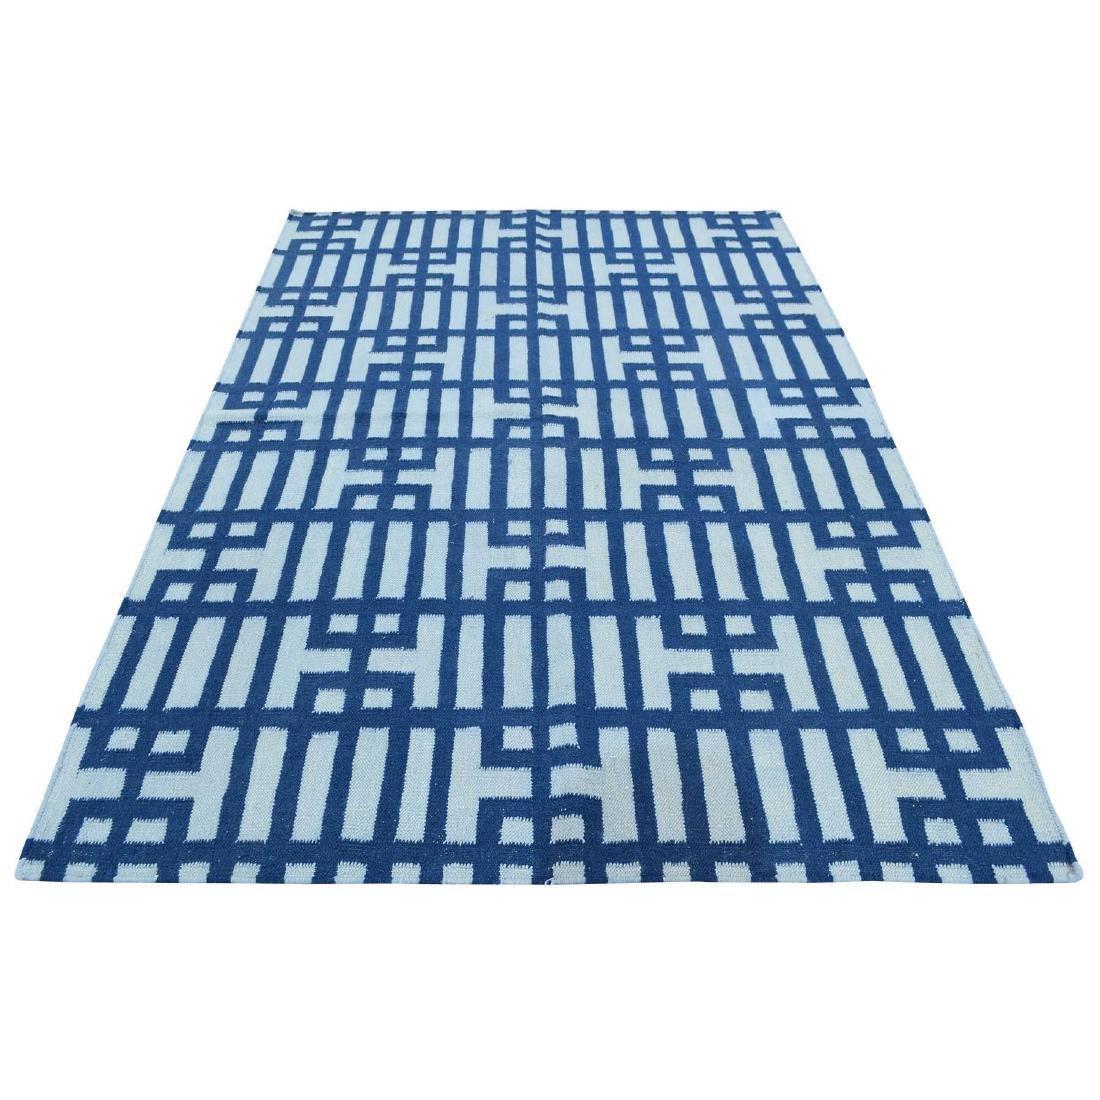 Hand Woven Flat Weave Reversible Kilim Pure Wool Rug